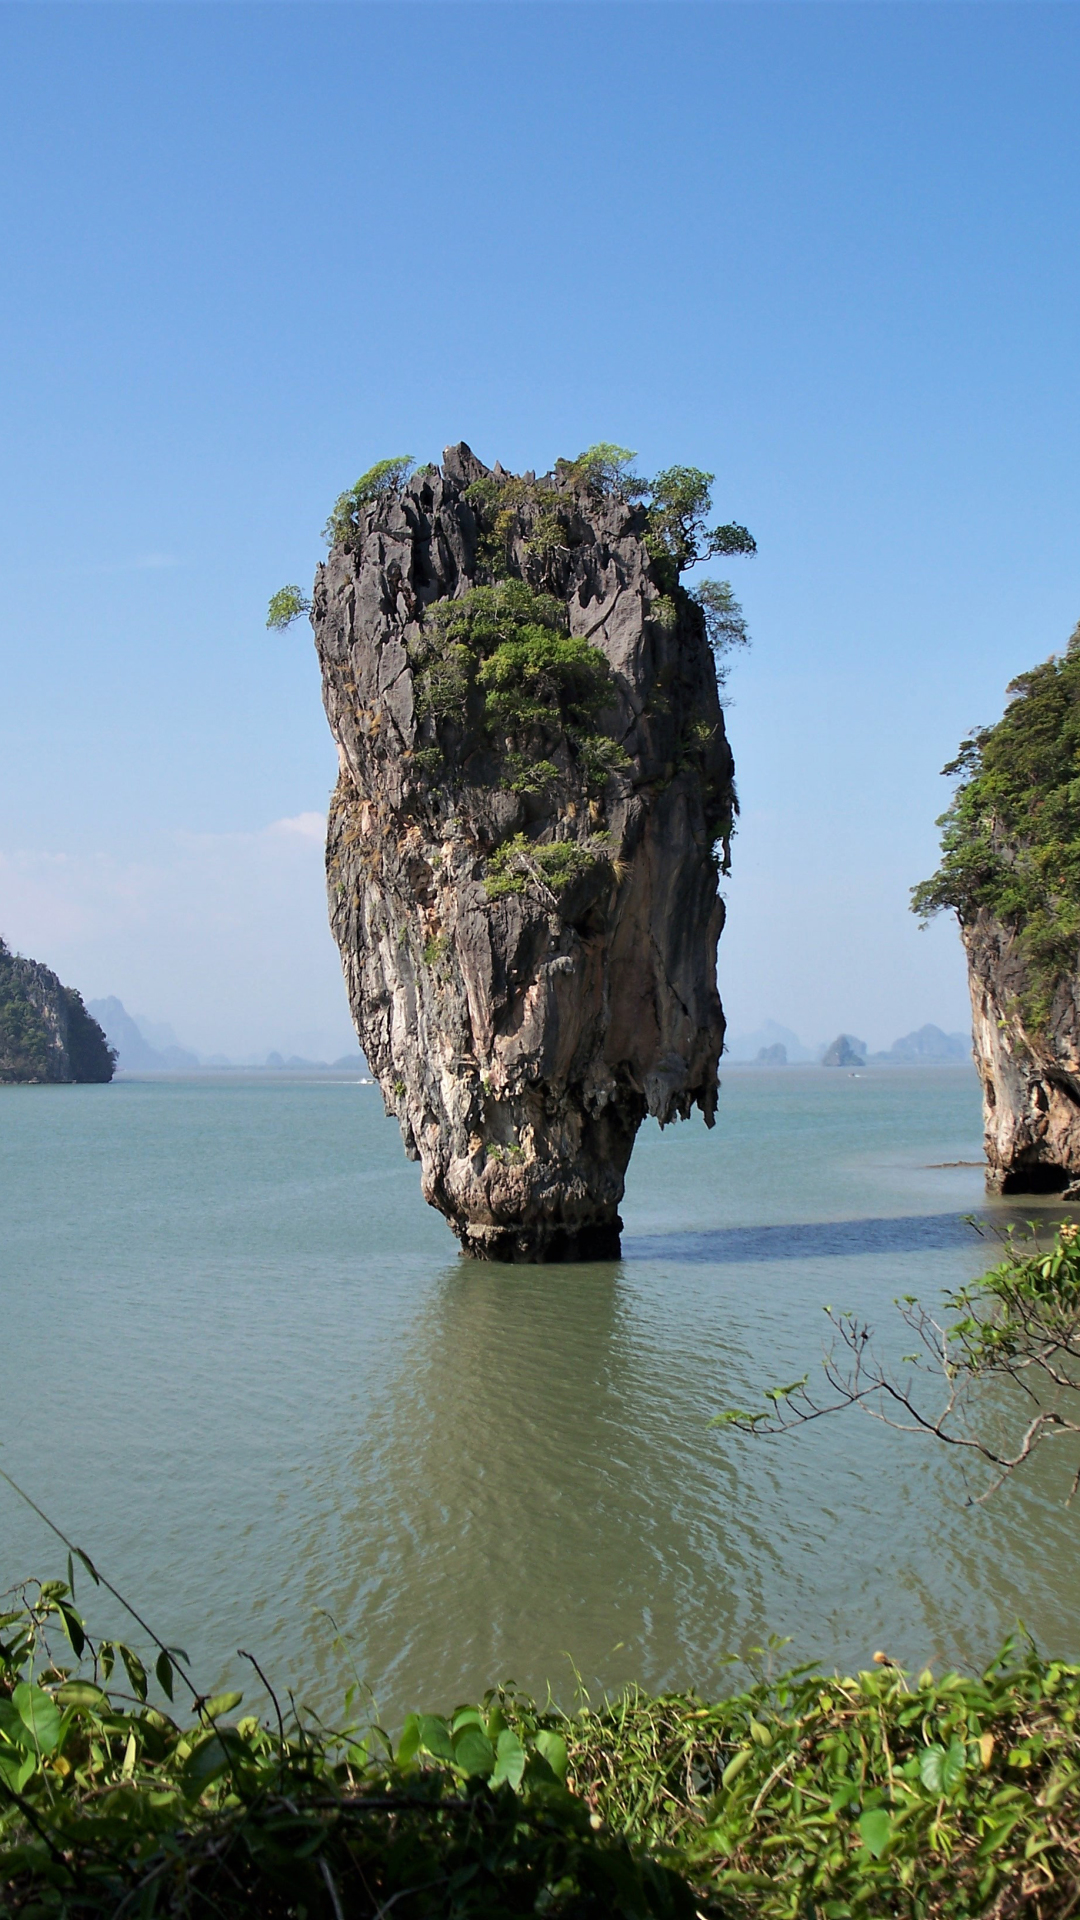 Discovery Khao Lak, Discovery Travel - Khao Lak, Khao Lak Mangrove Explorers; Discovery Travel; Eco Khao Lak Adventure; James Bond Island; Local Life; Sea Cave Canoe; Temples; Kayaking; Phang Nga; Ethical Tourism; Tour; Day Trip; Eco Khao Lak Adventure; Thailand;